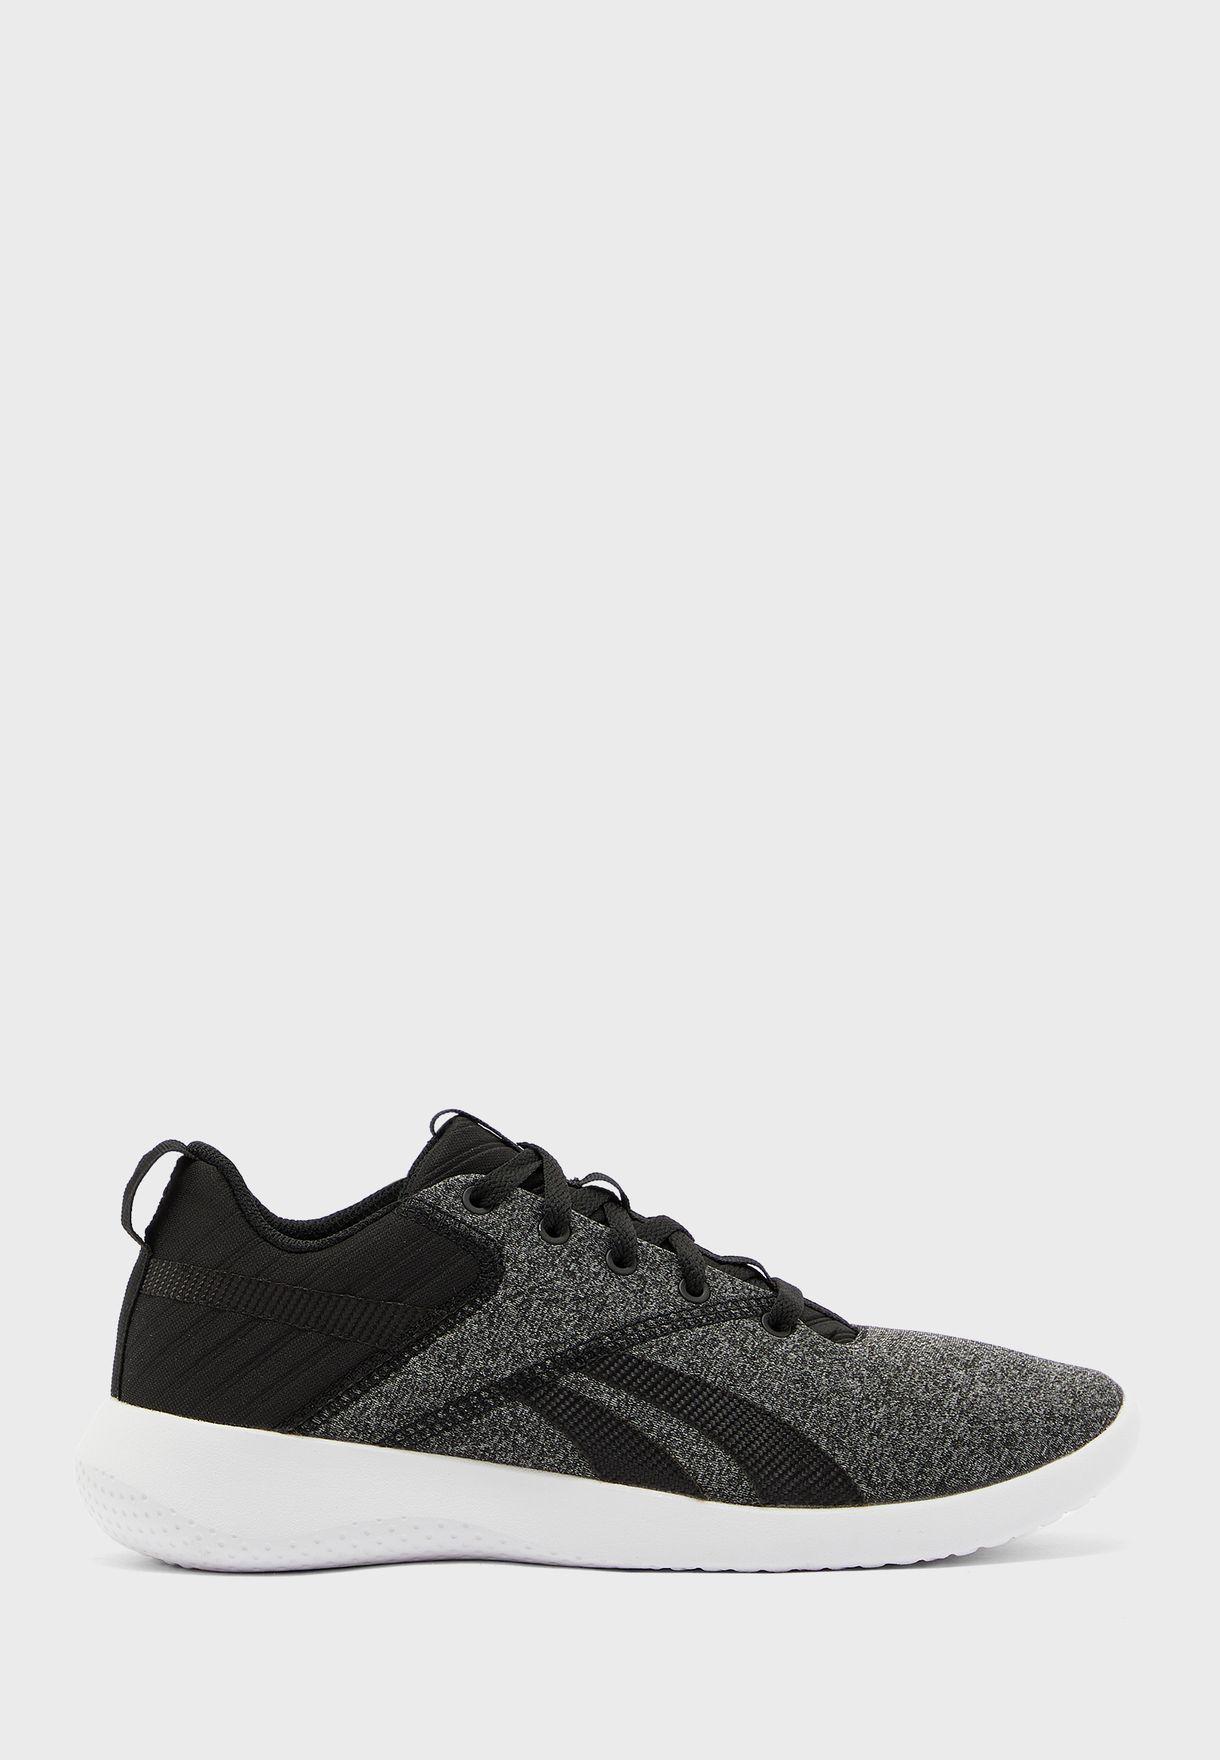 Ardara 3.0 Athletic Sports Walking Women's Shoes